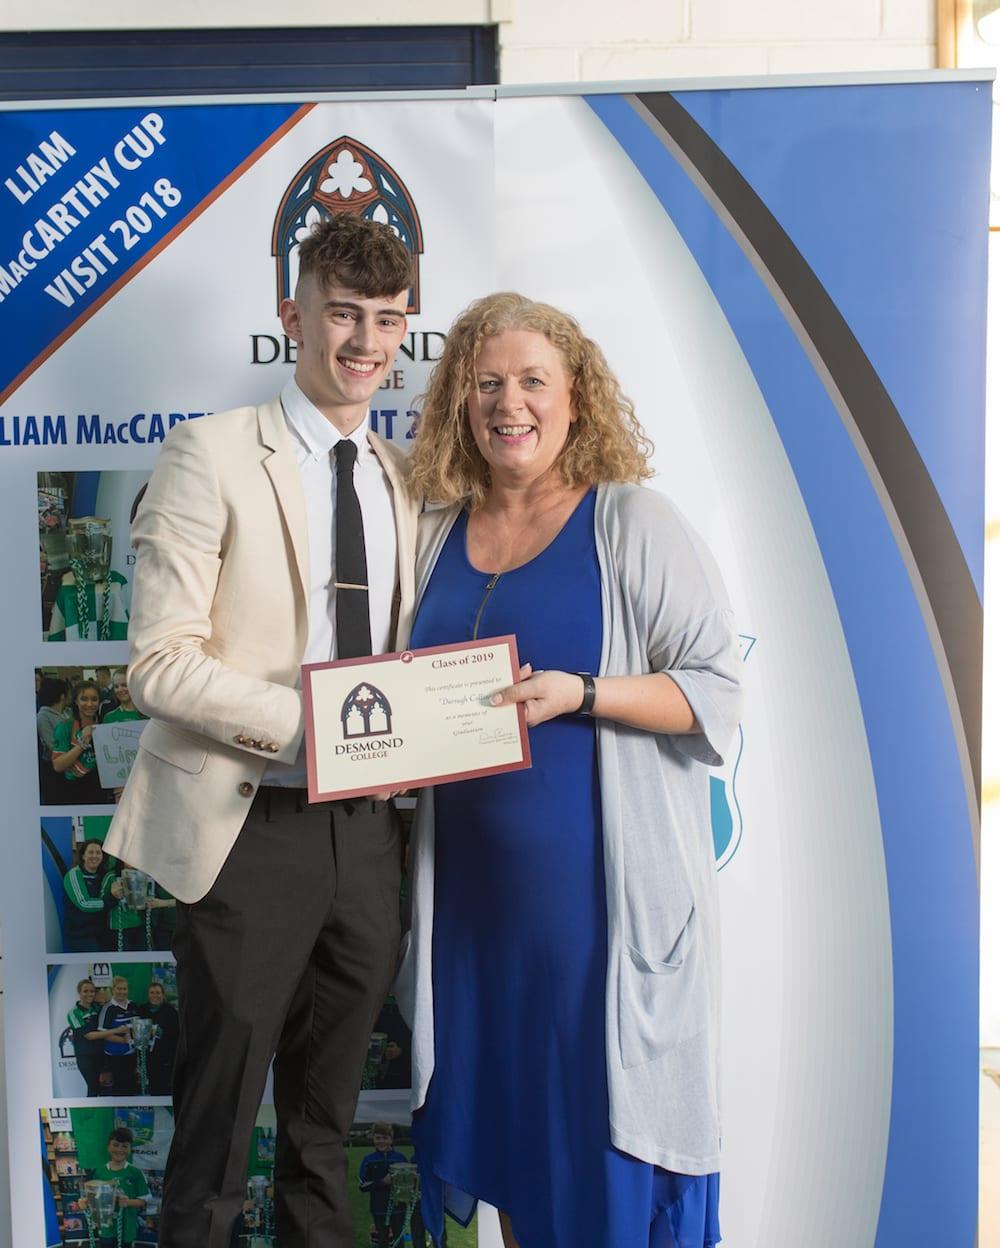 Desmond College Graduation 2019